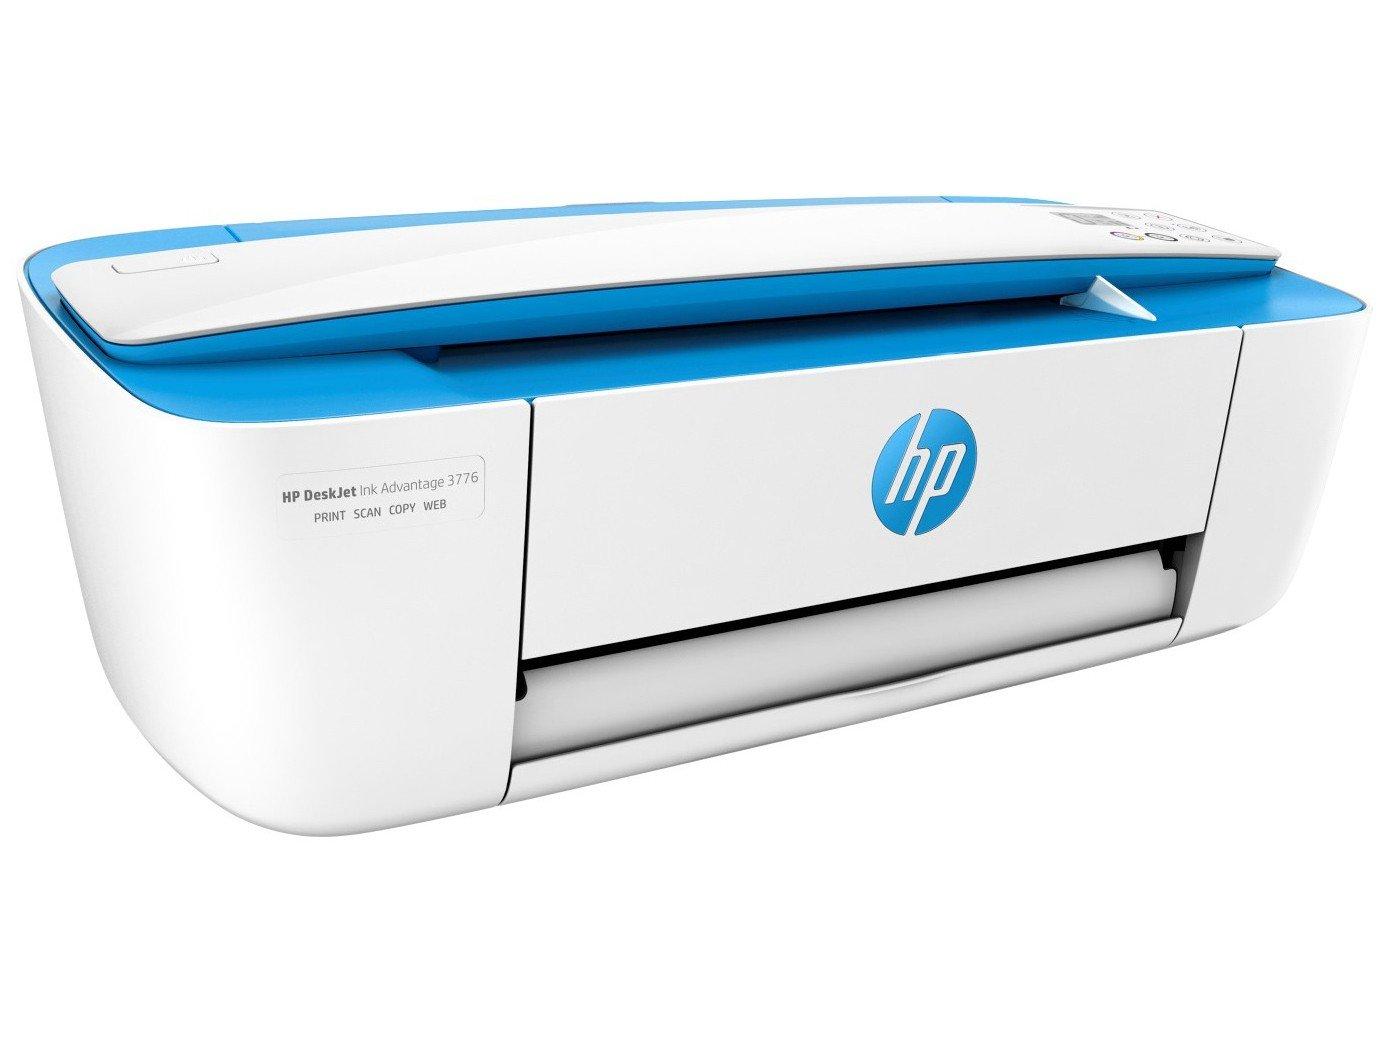 Foto 8 - Multifuncional HP DeskJet Ink Advantage 3776 - Jato de Tinta Display LCD Wi-Fi